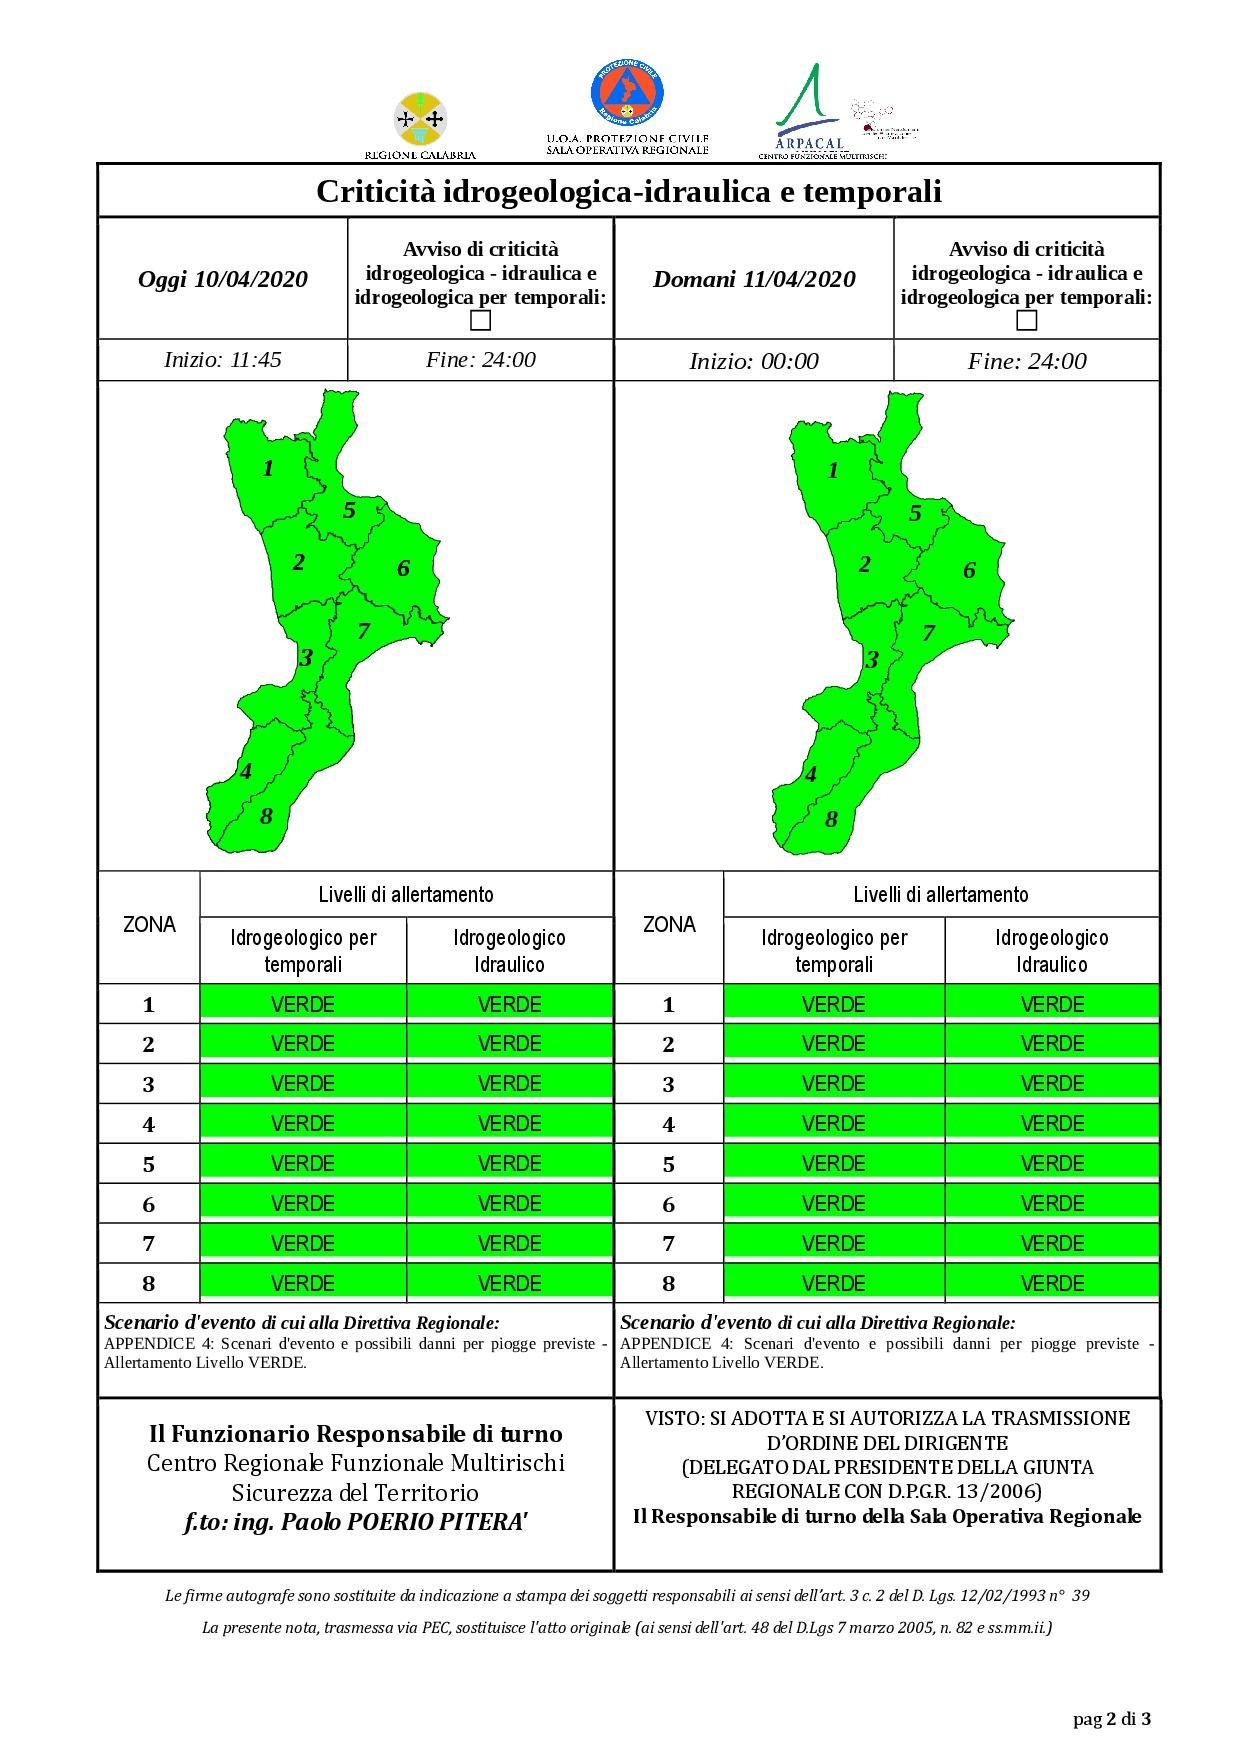 Criticità idrogeologica-idraulica e temporali in Calabria 10-04-2020